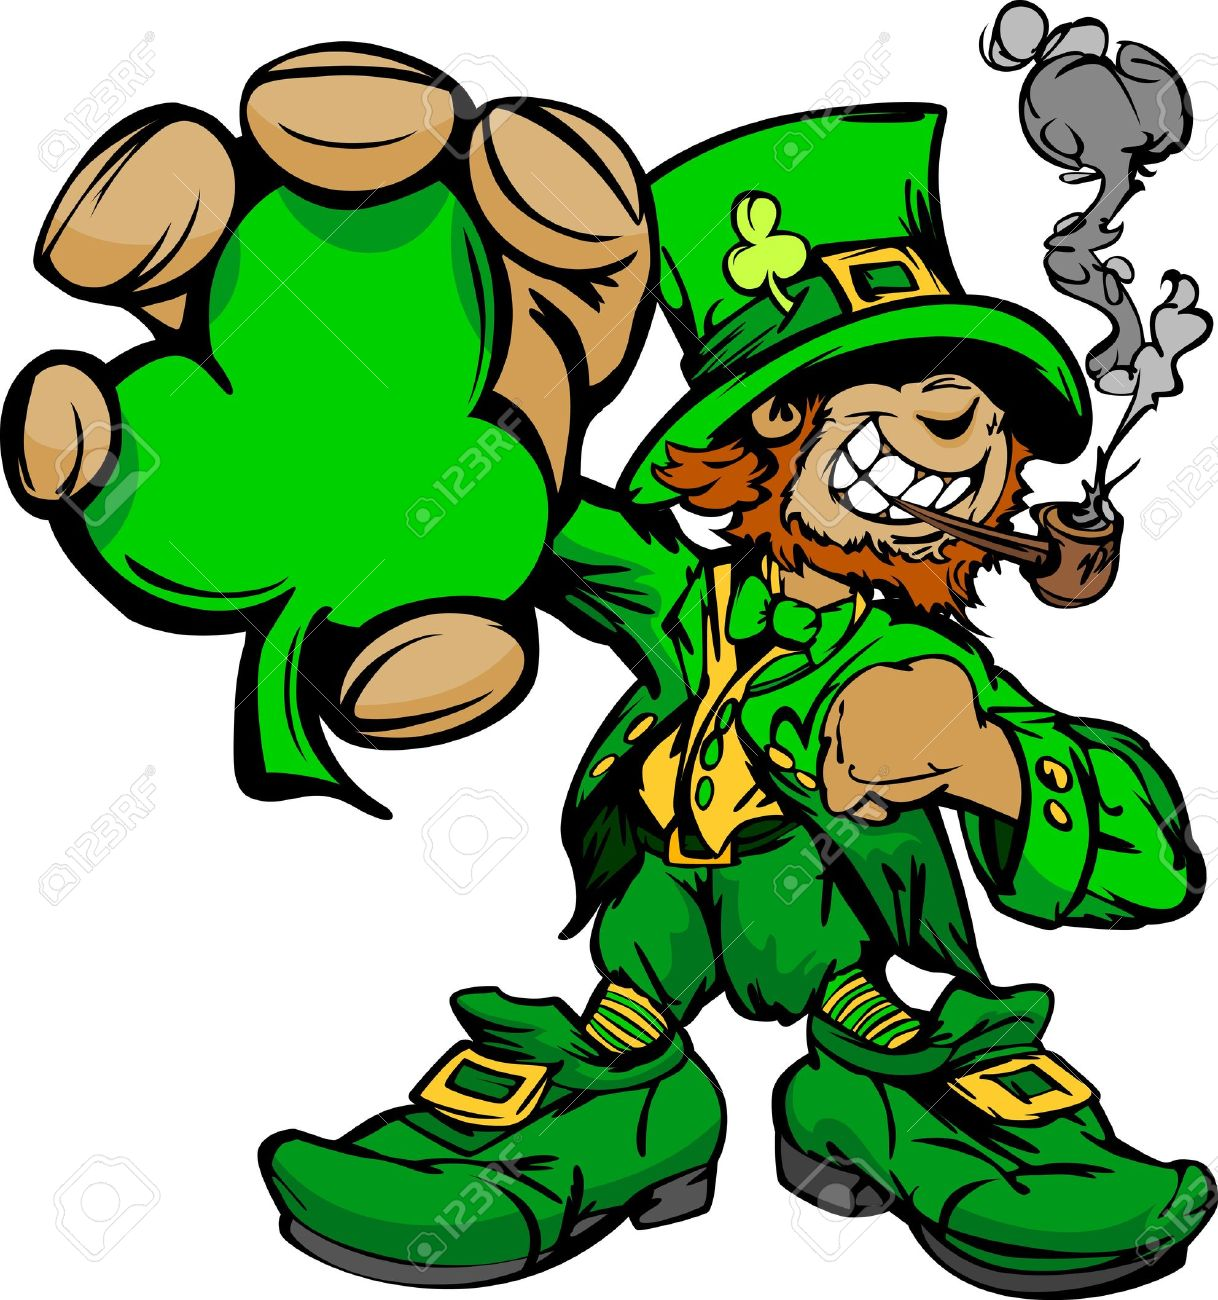 happy cartoon leprechaun on st patricks day holiday vector illustration stock vector 12050544 - Holiday Cartoons Free